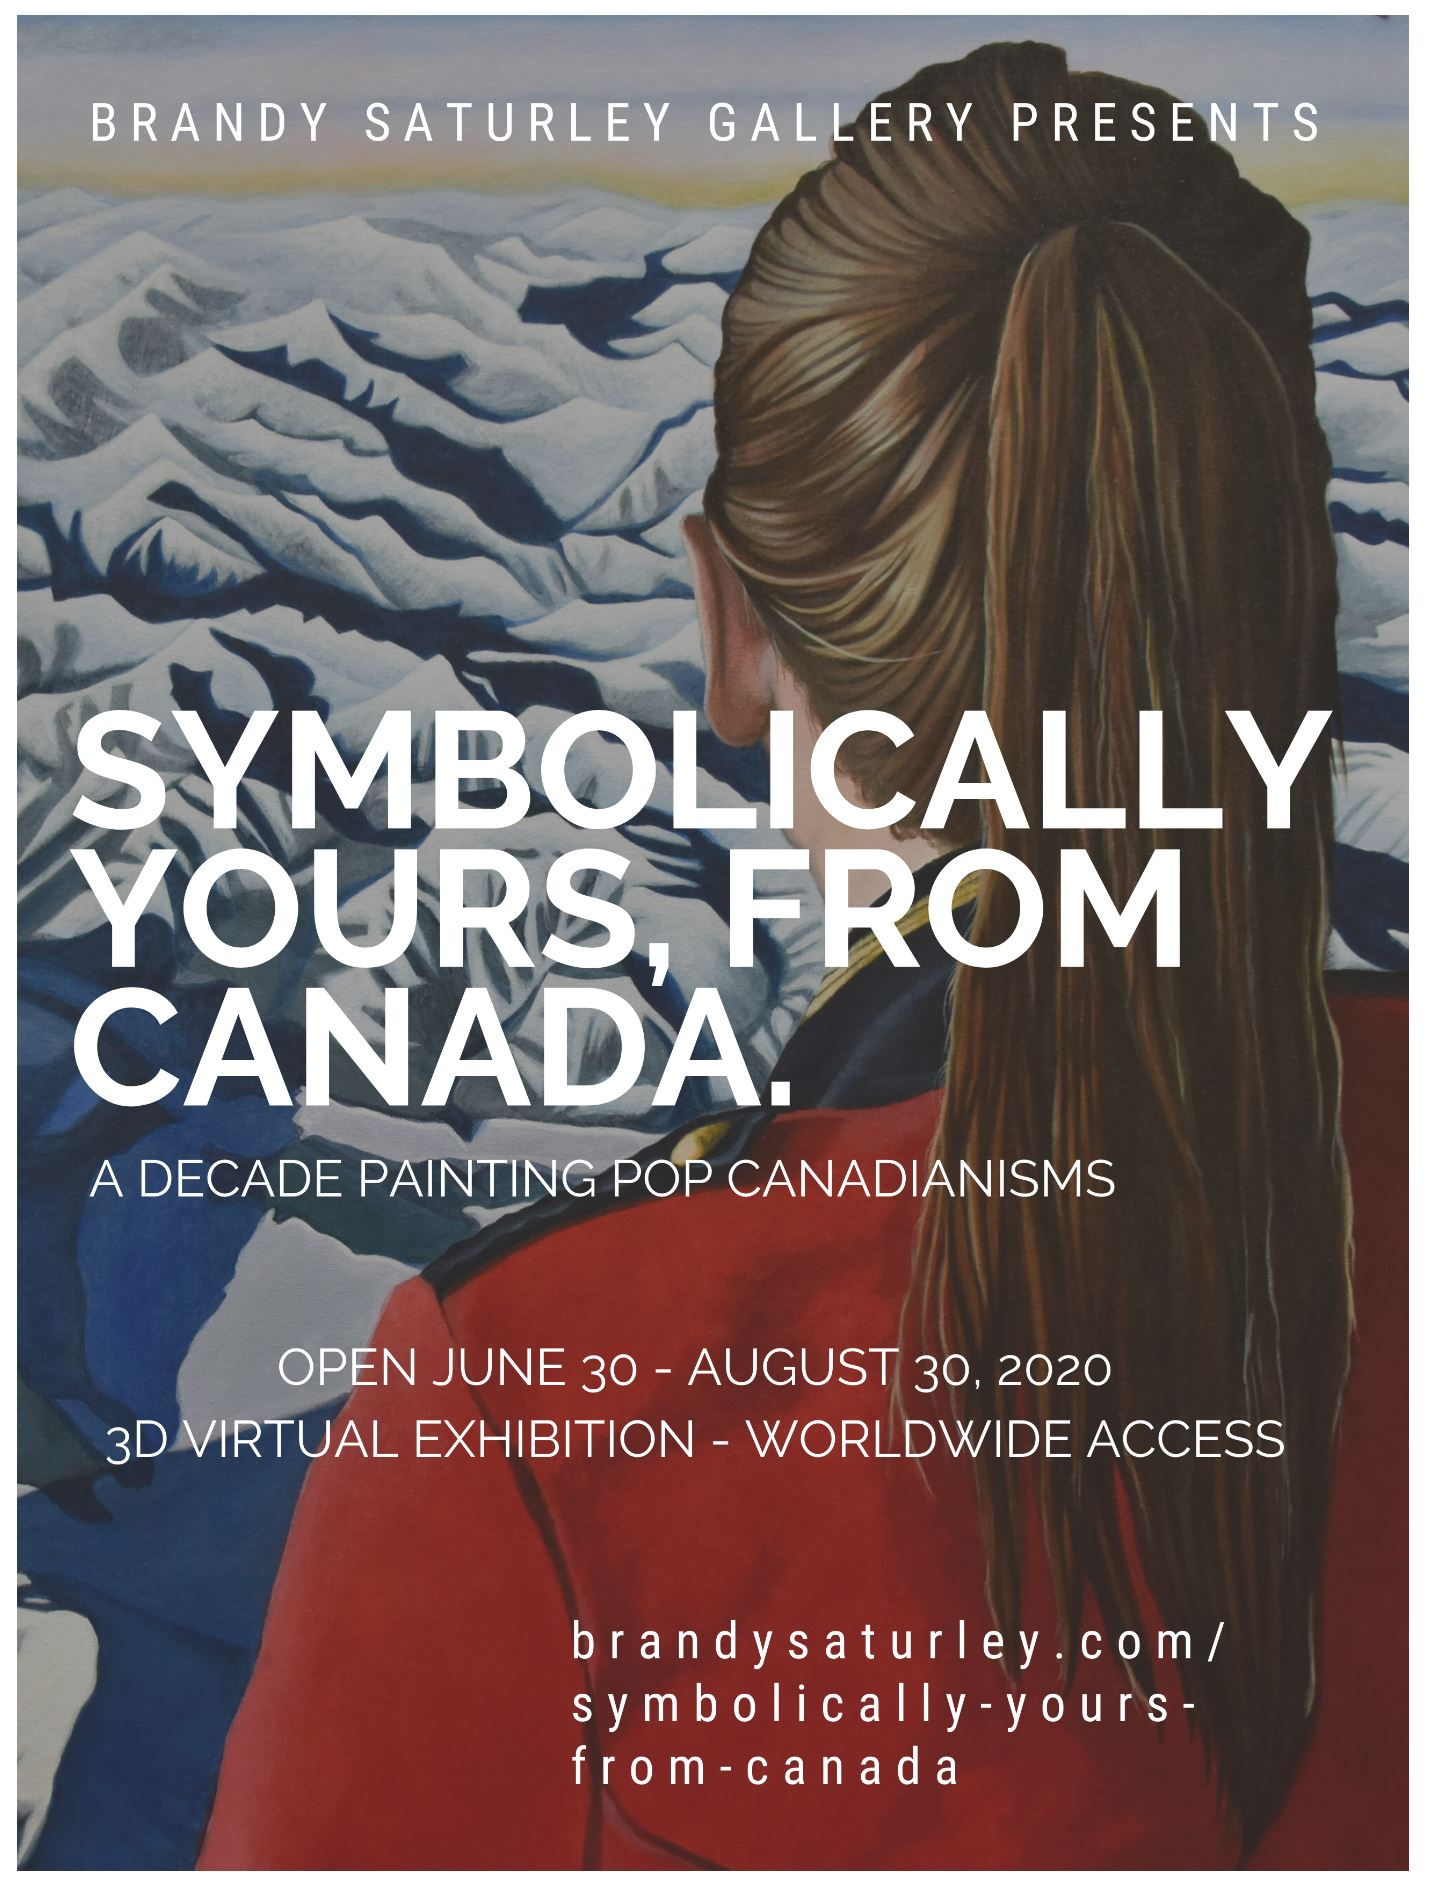 Brandy Saturley Gallery Canadian Paintings